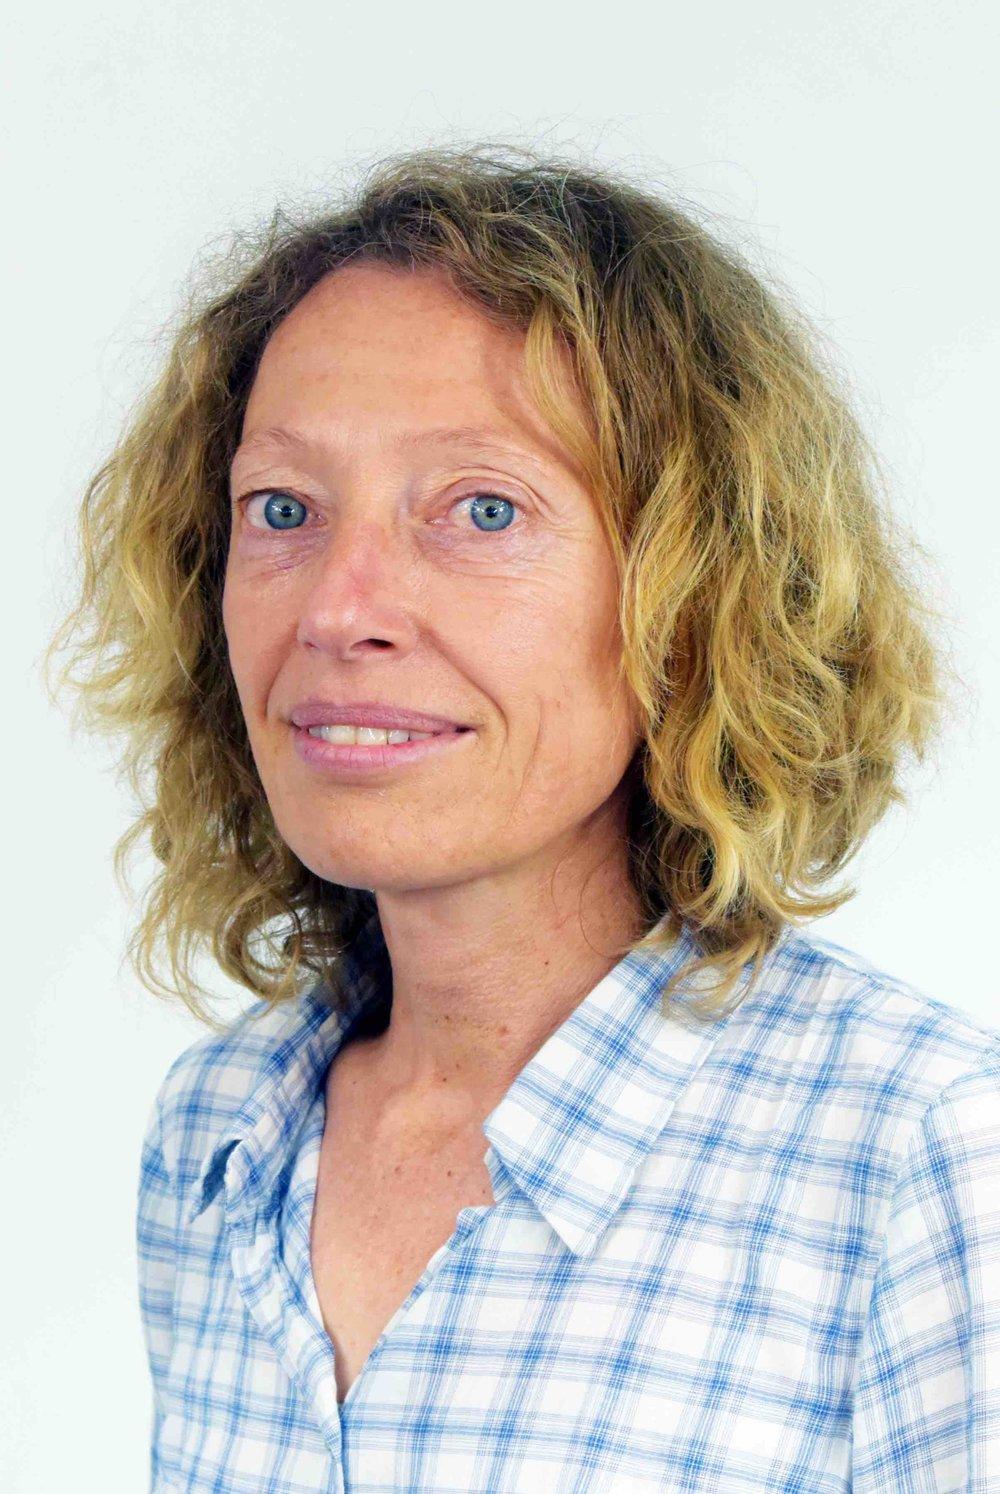 Guest post by Joky François, Global Theme Lead Gender, Rainforest Alliance